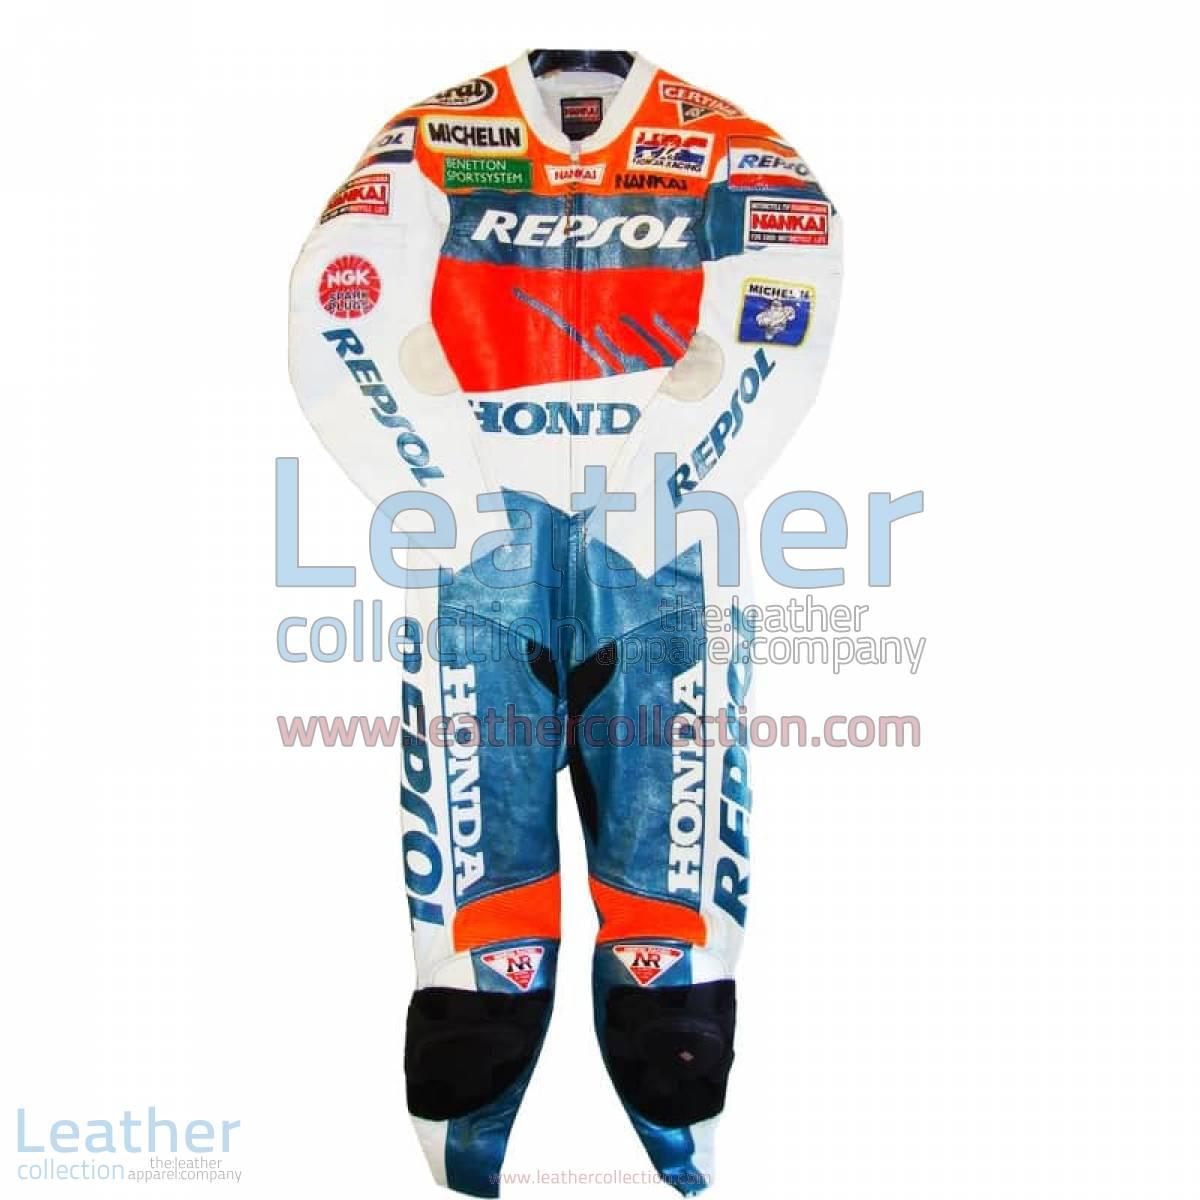 Mick Doohan Repsol Honda GP 1997 Leathers | repsol honda